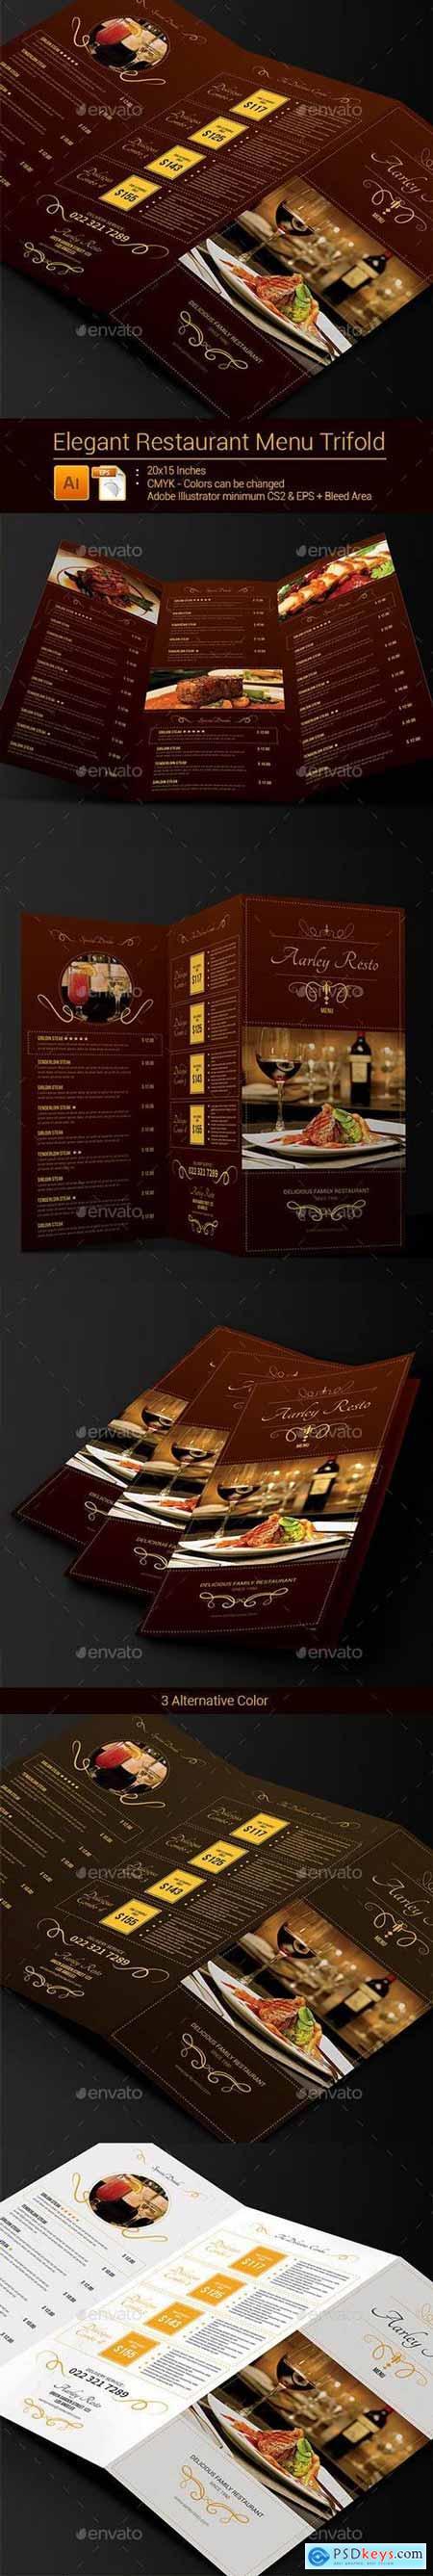 Elegant Restaurant Menu Trifold 9137918